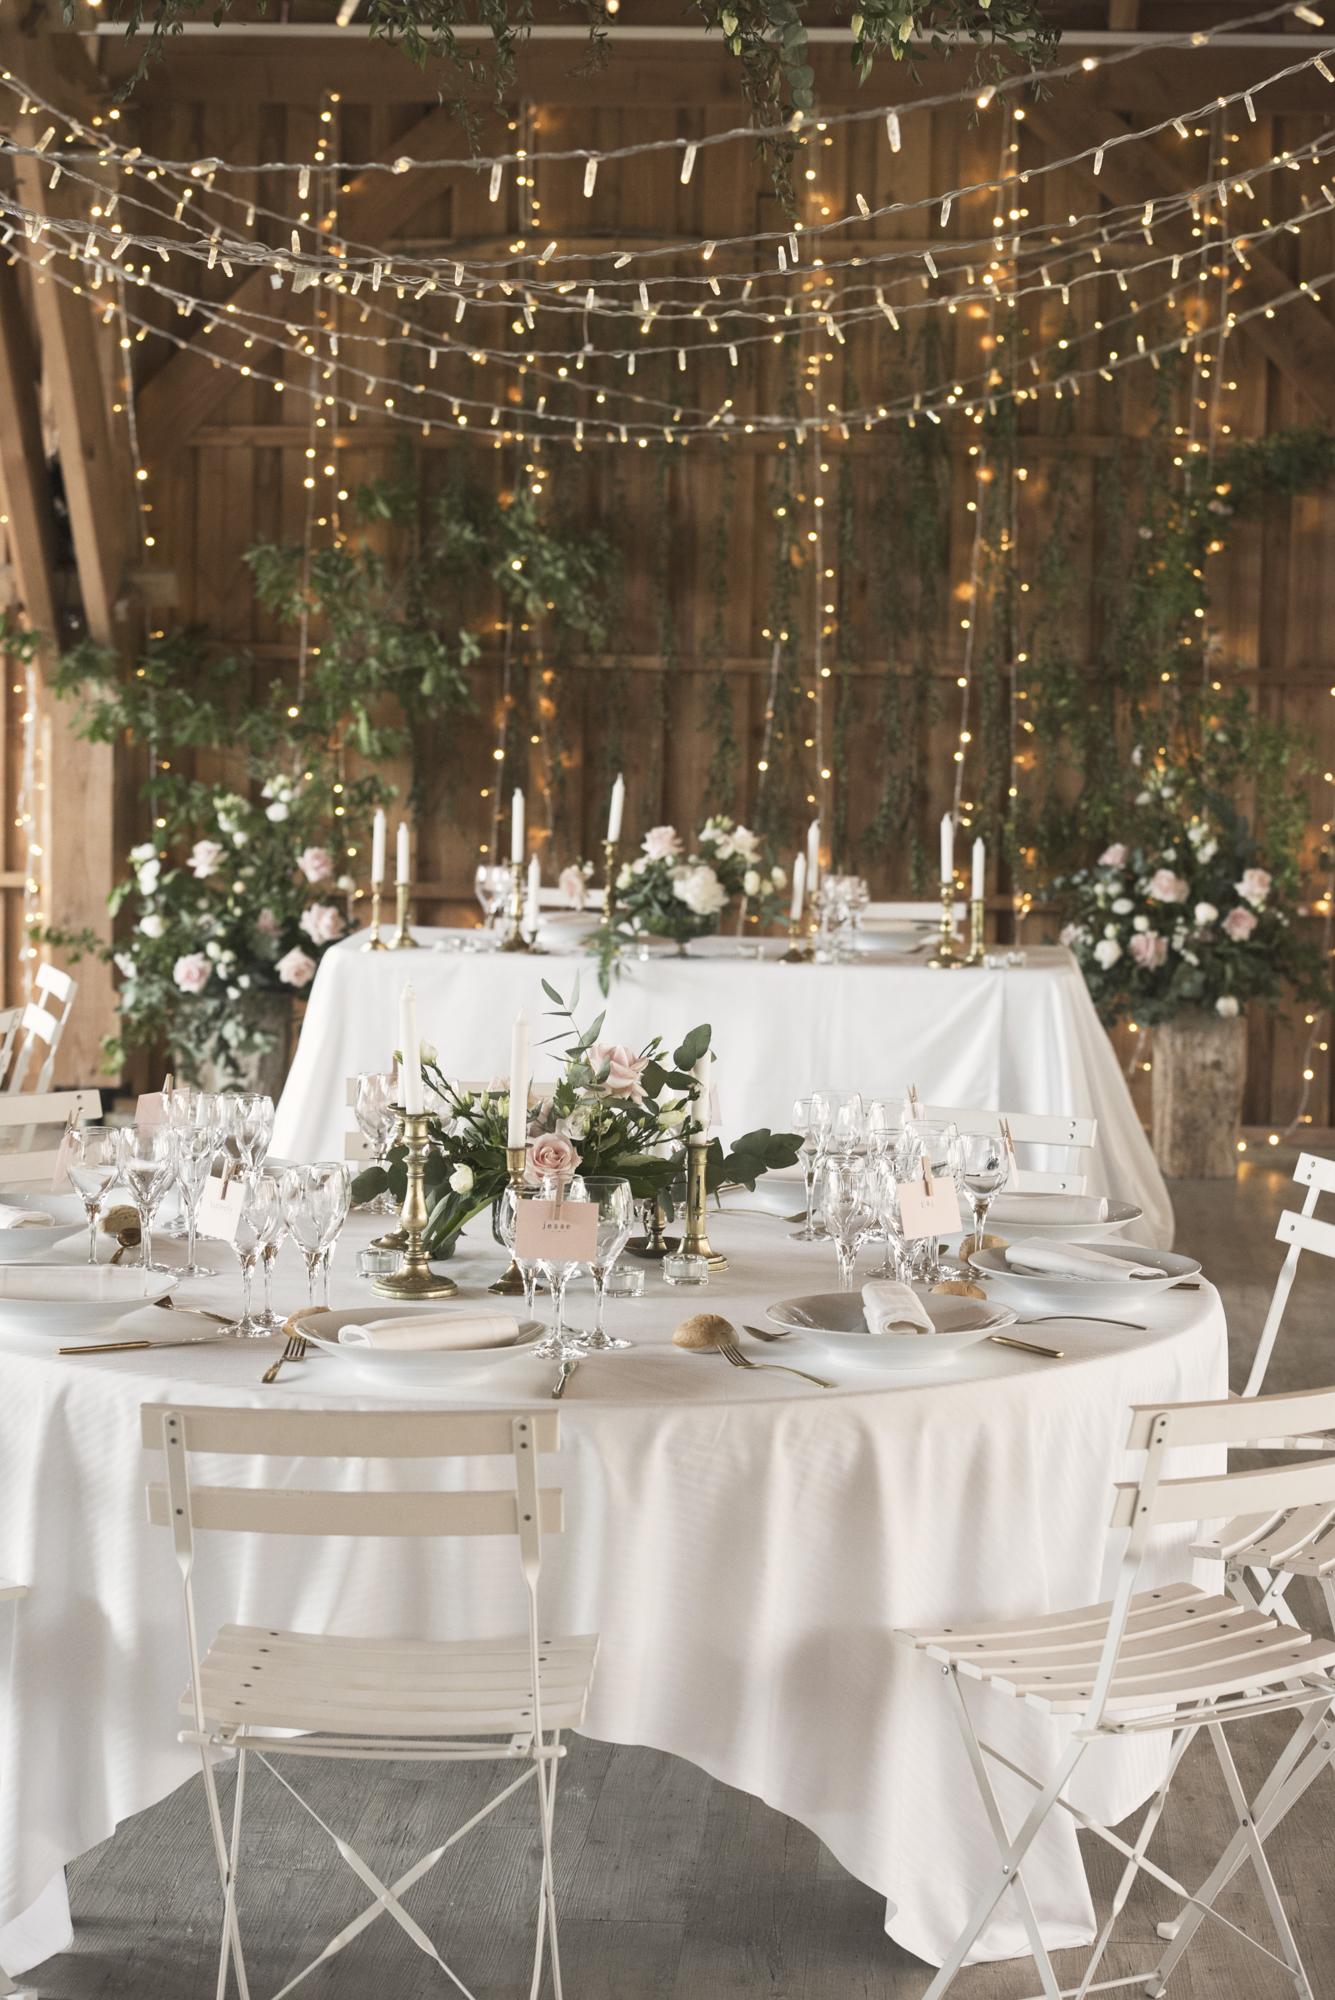 French wedding dinner inspiration